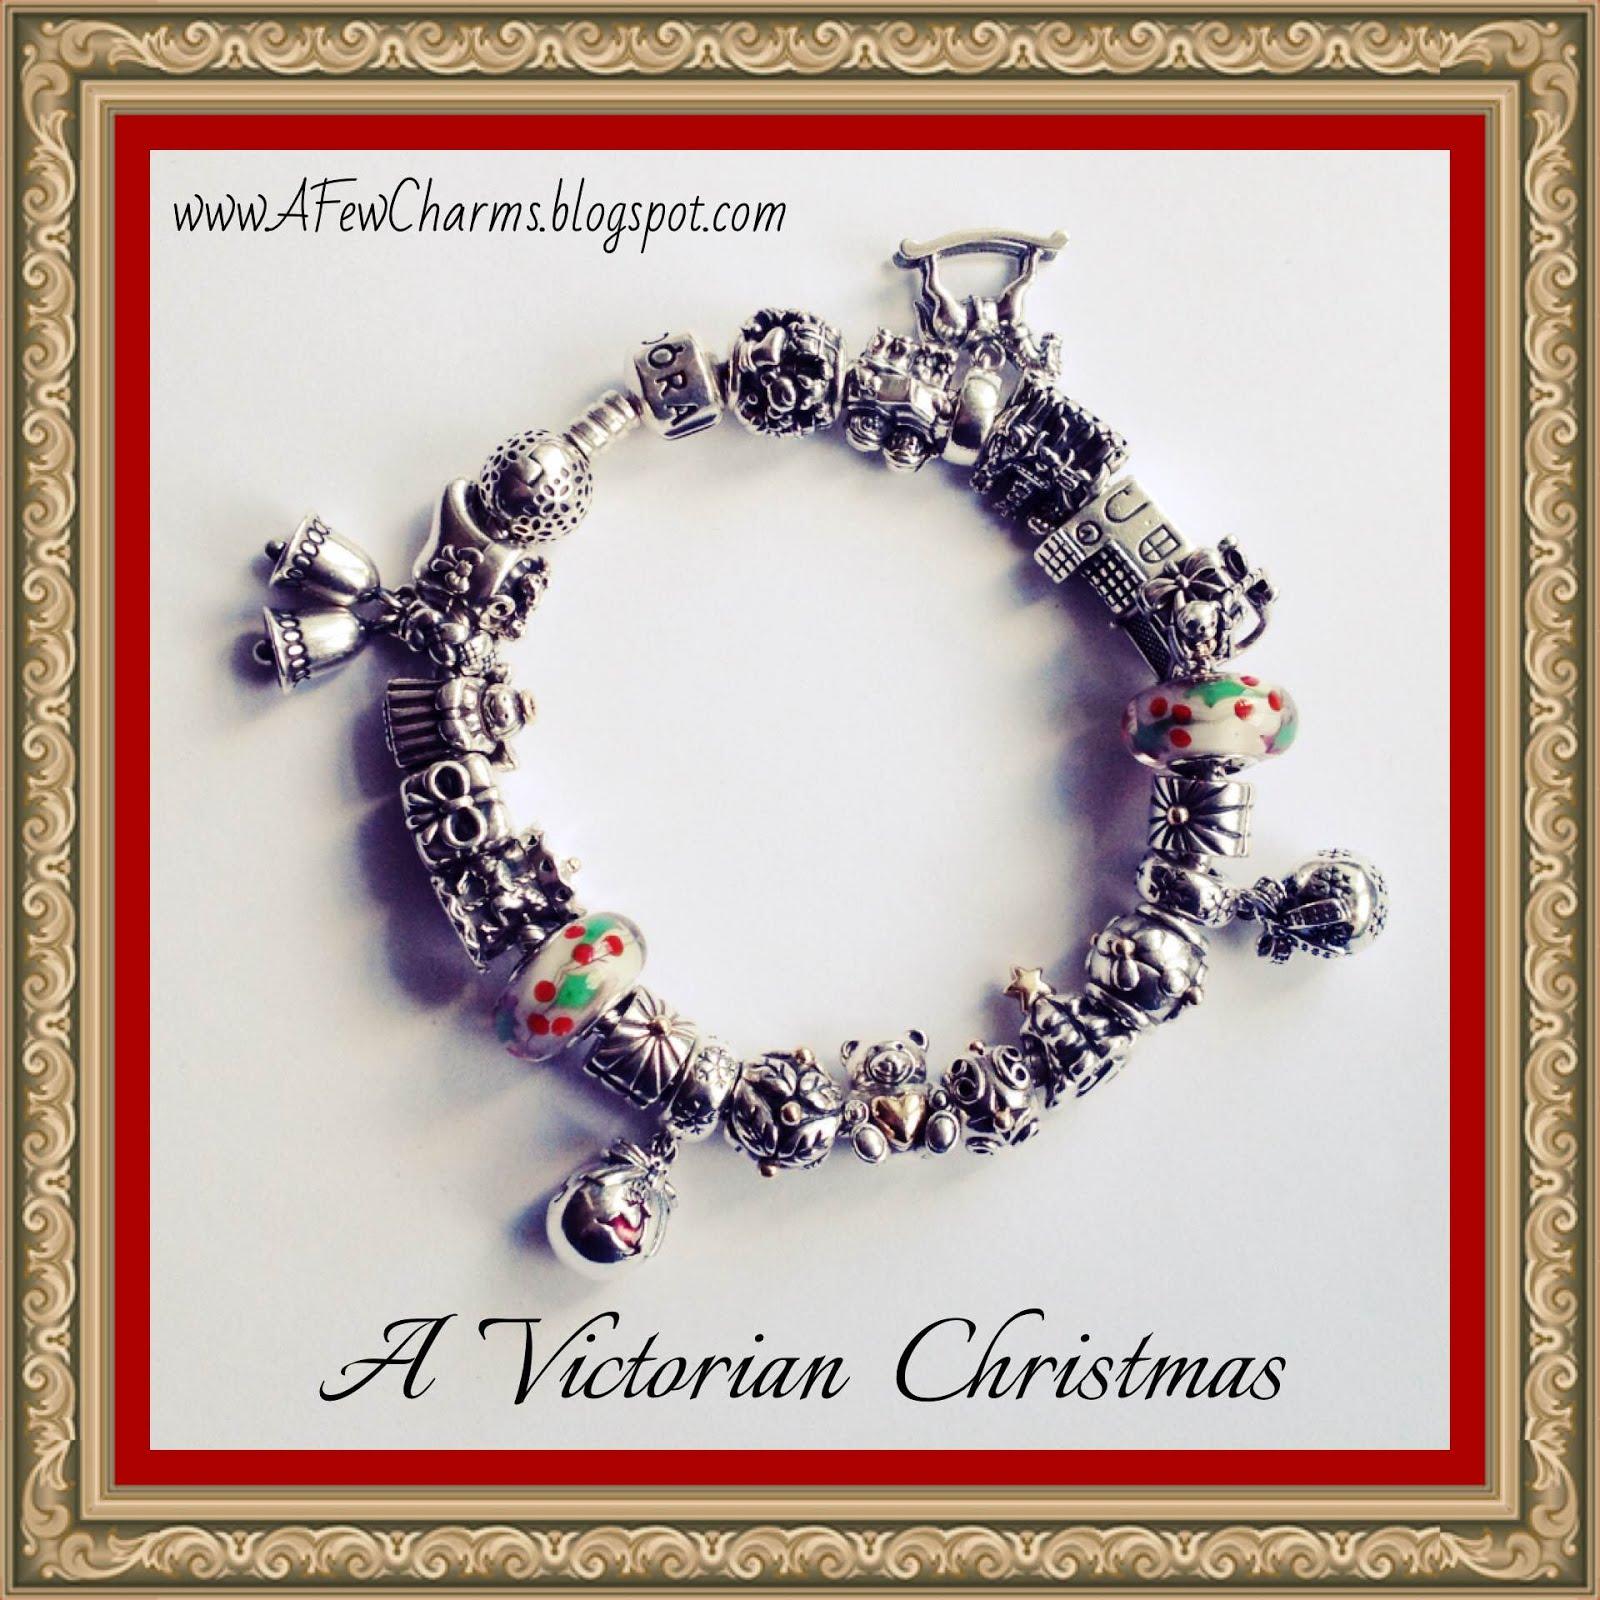 A Victorian Christmas bracelet